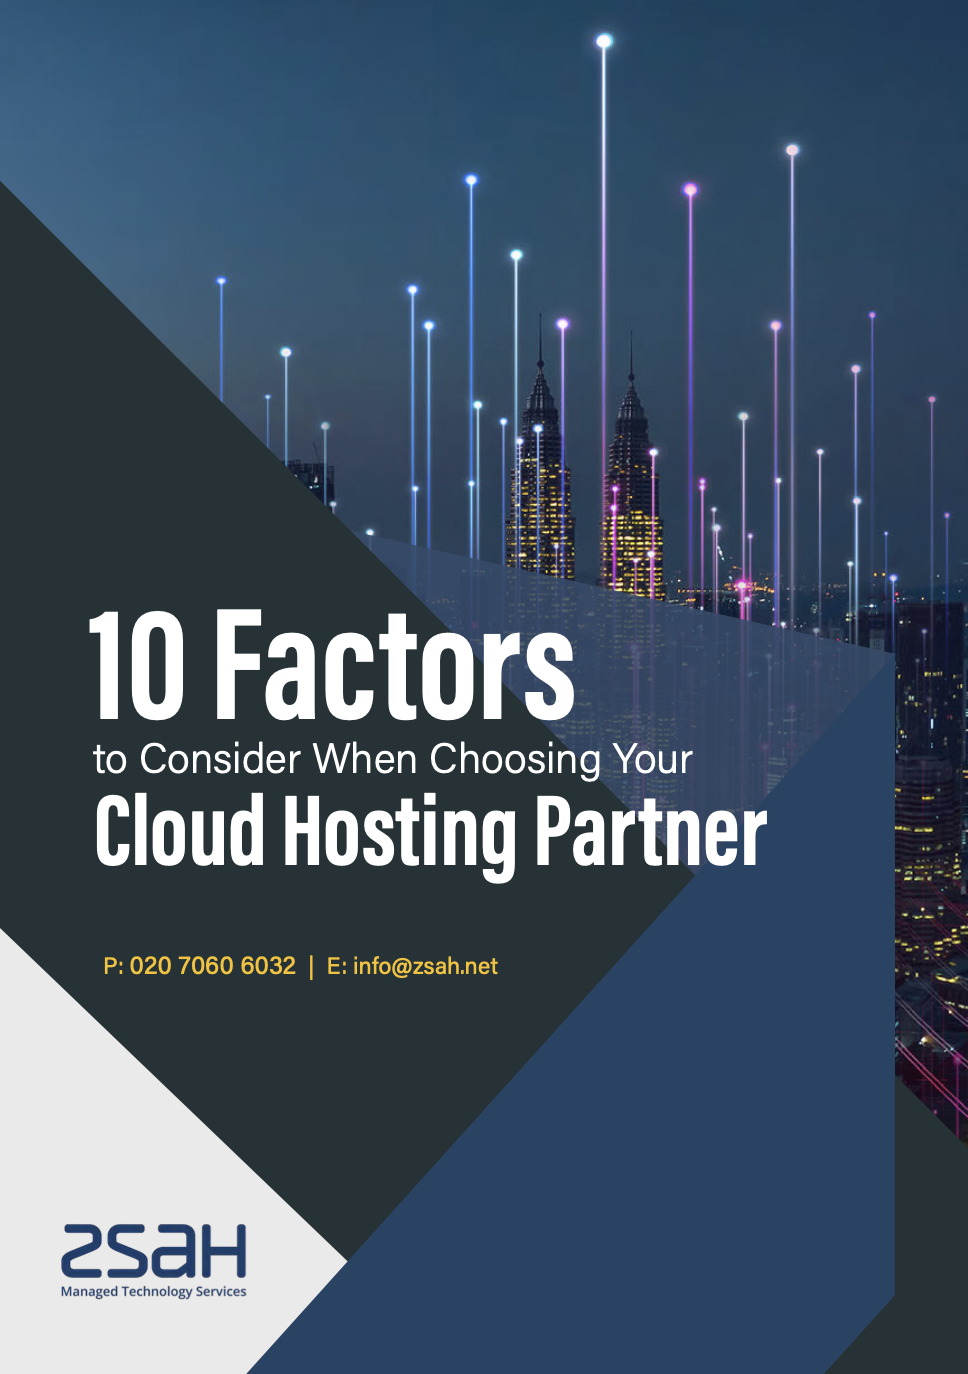 10 factors to consider when choosing your cloud hosting partner